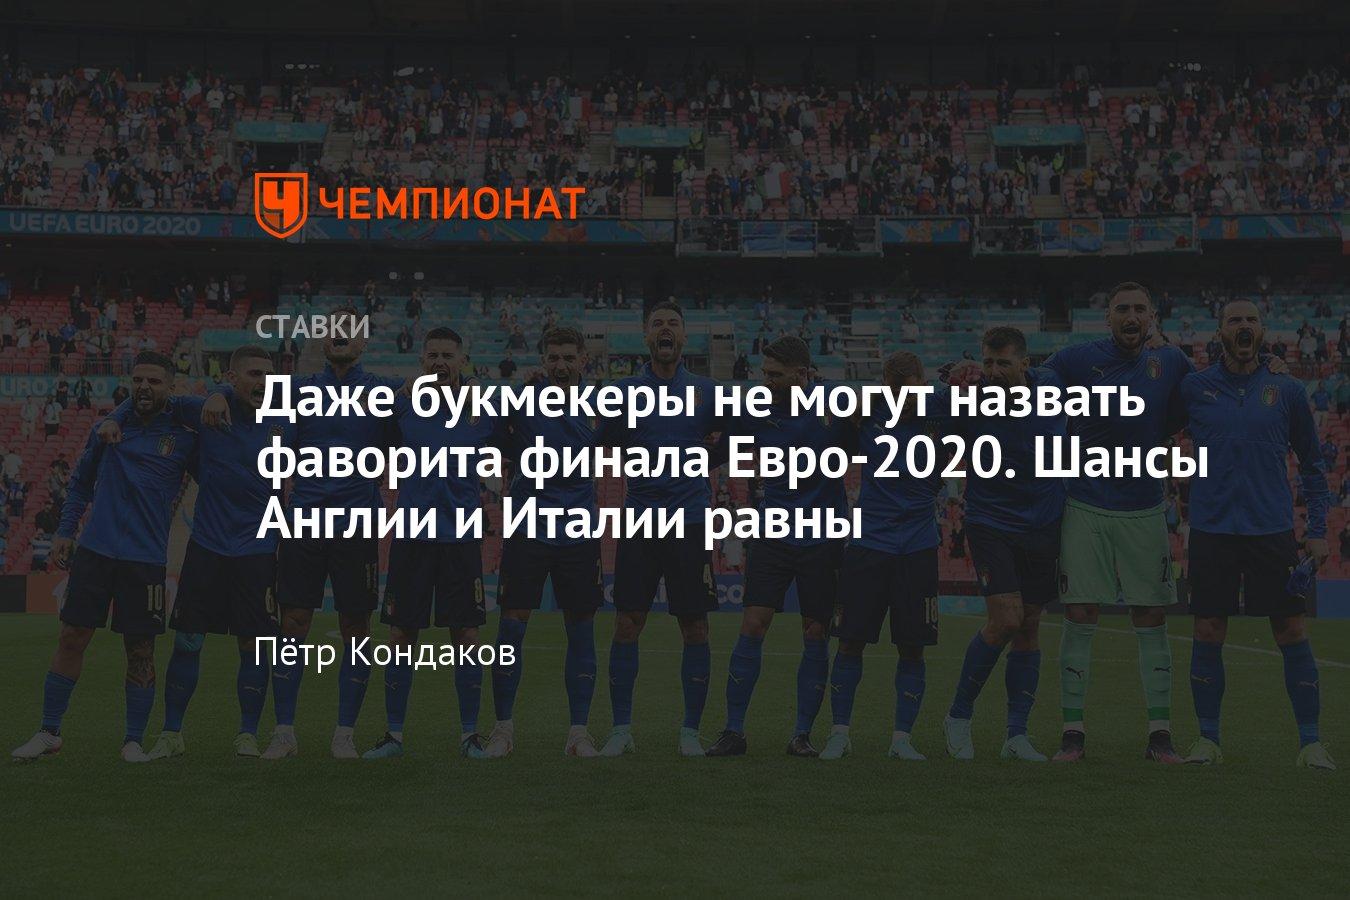 Ставки на футбол евро финал правила ставки бонуса в мелбет